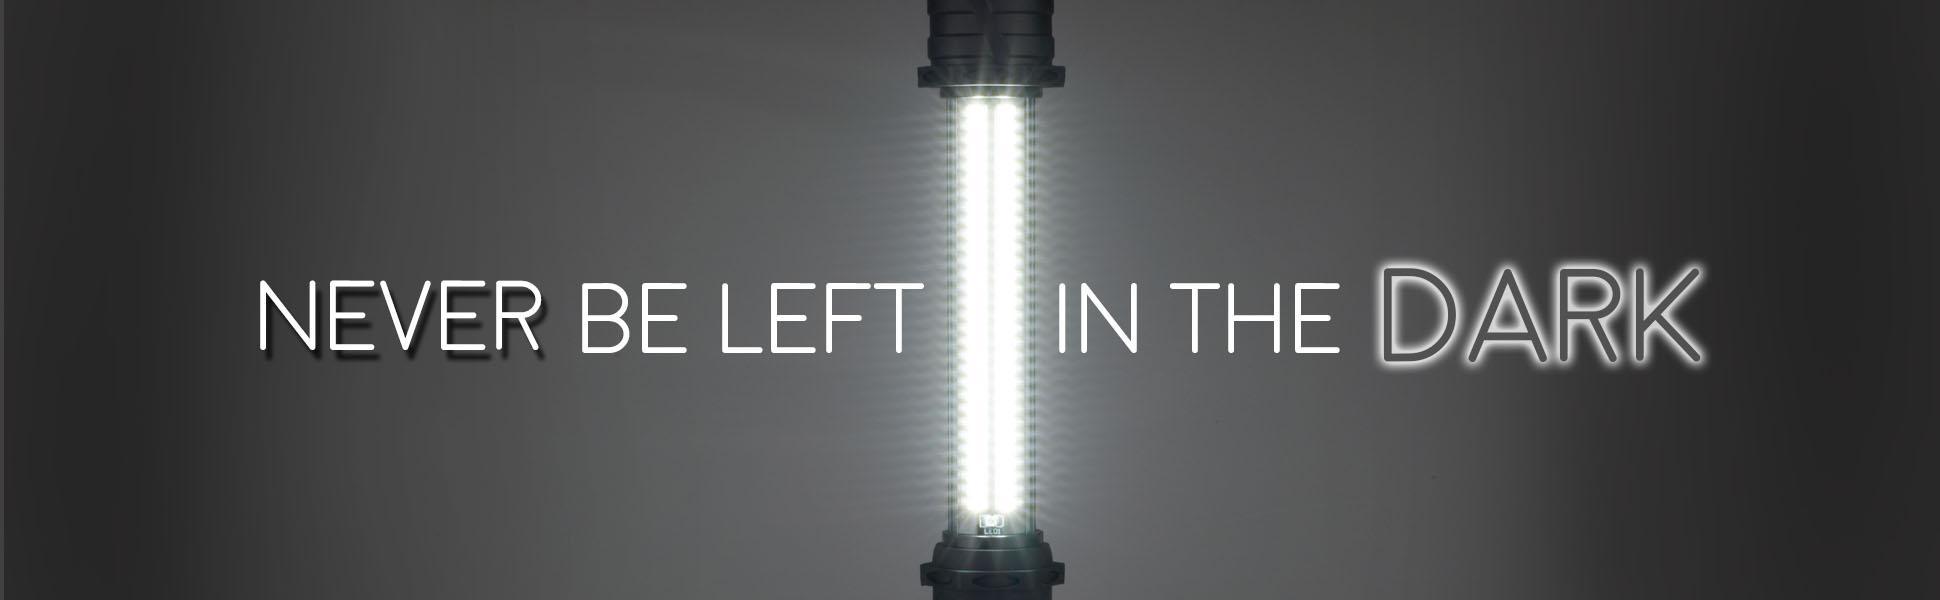 Neiko 40464A Cordless LED Work Light 350 Lumens 5 Hours Run Tim